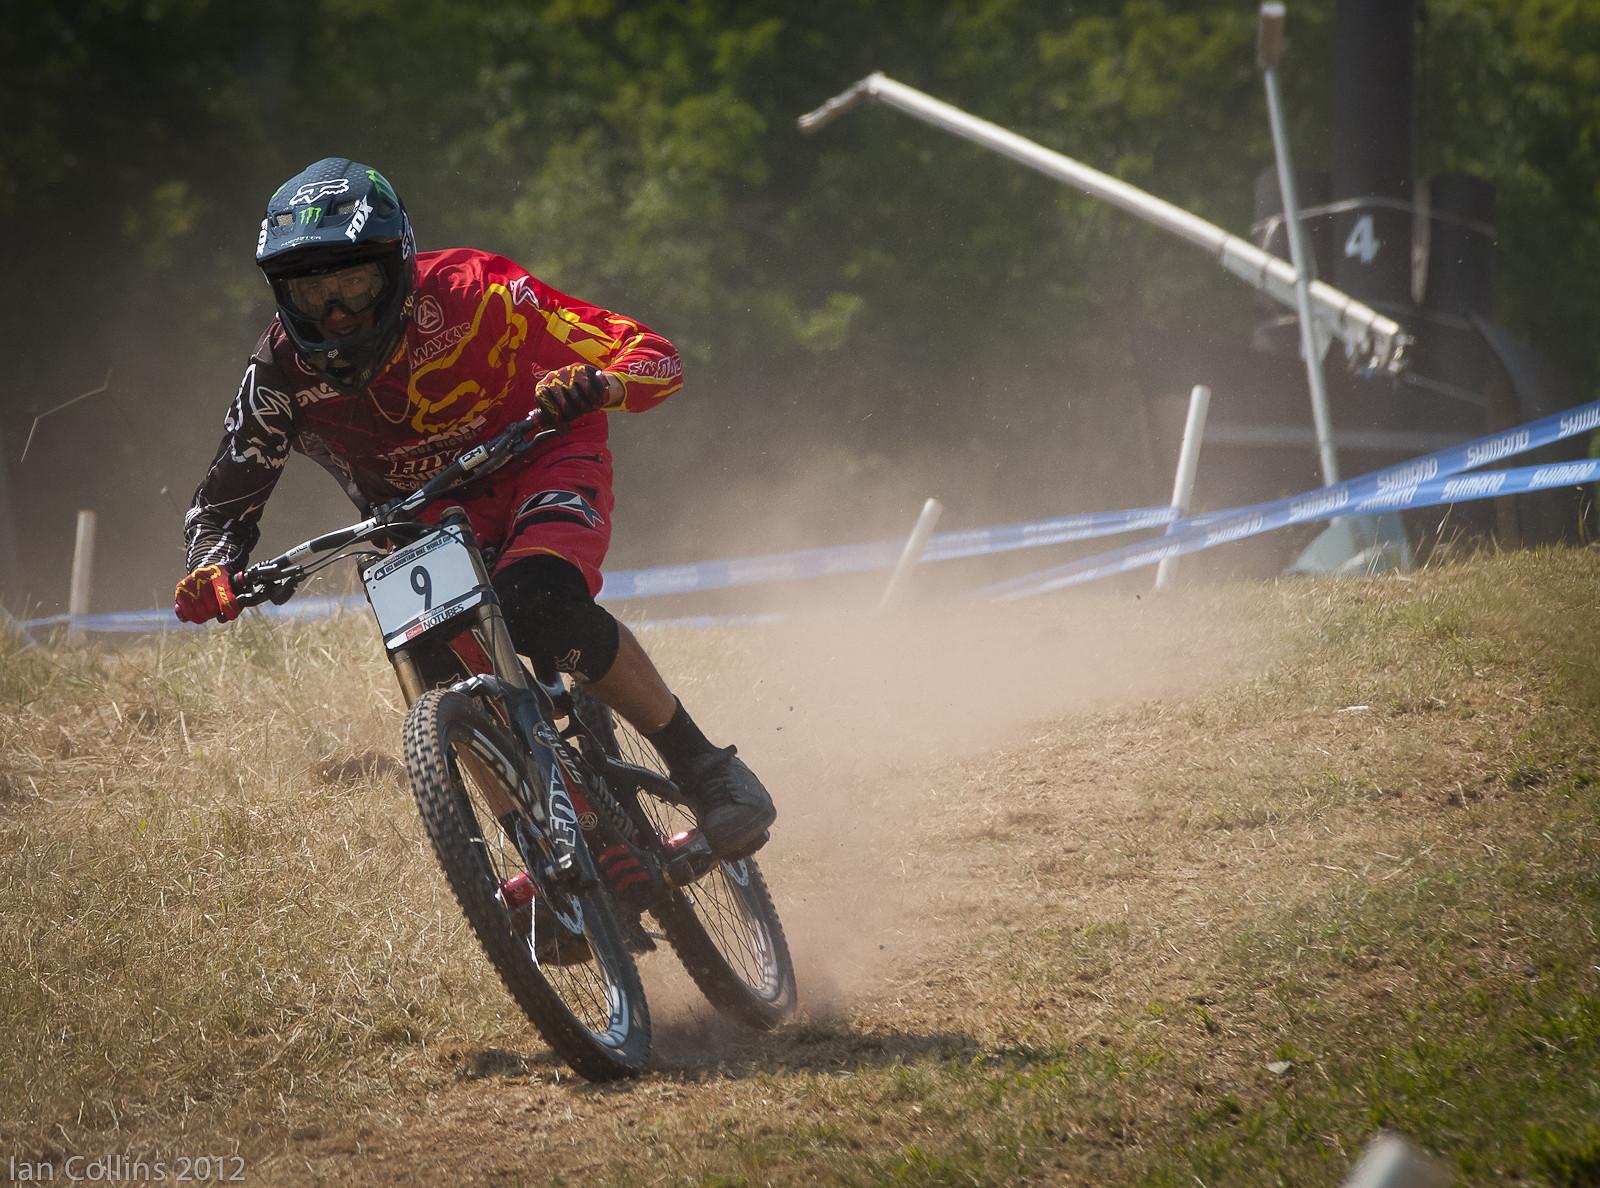 Josh Bryceland - Ian Collins - Mountain Biking Pictures - Vital MTB